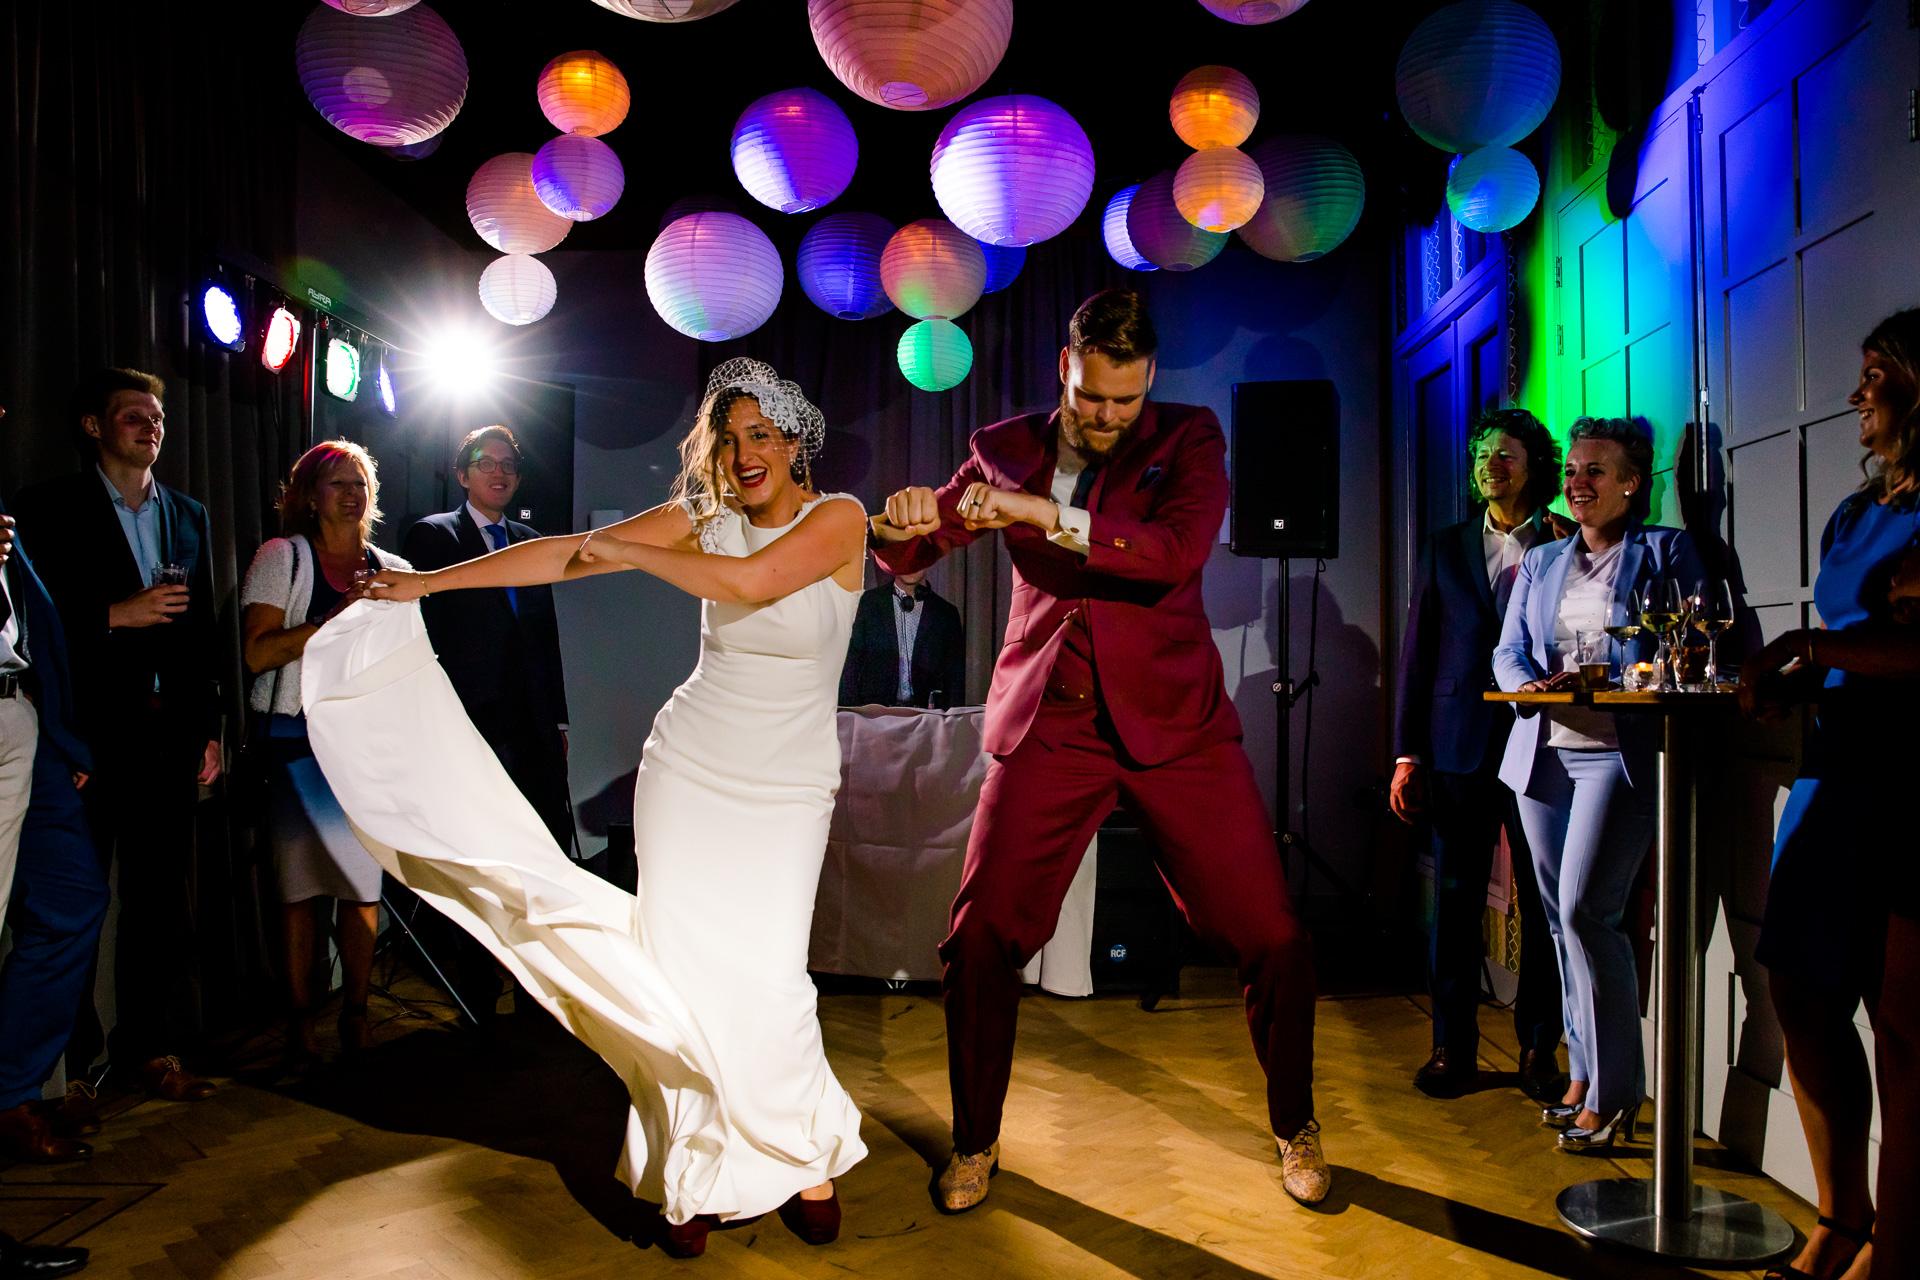 Openingsdans bruiloft first dance